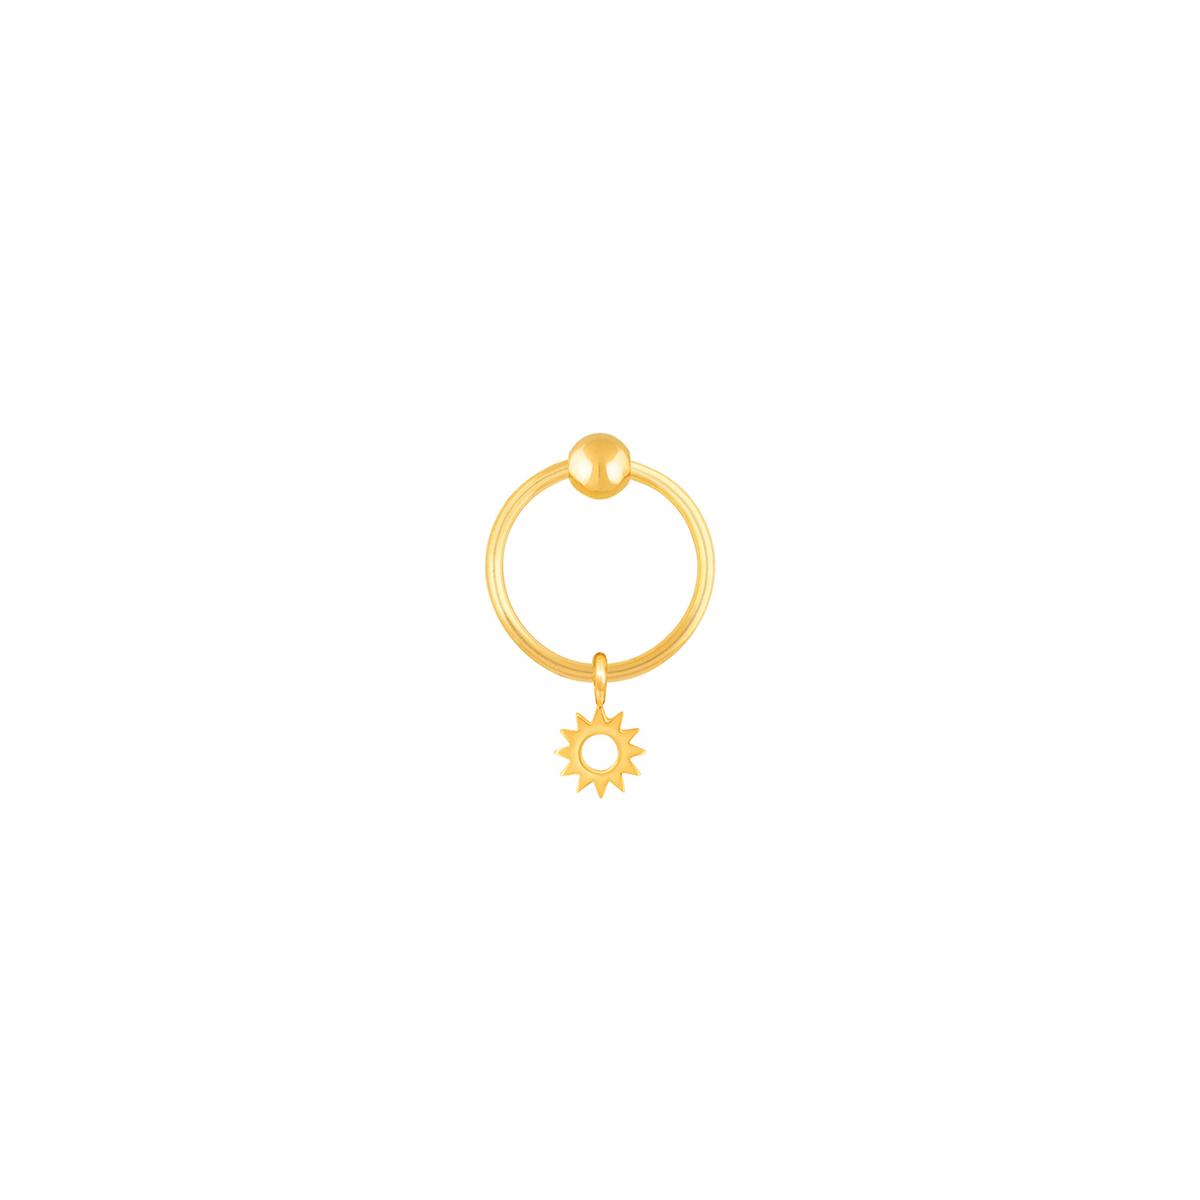 گوشواره طلا تک لنگه ای خورشید و گوی